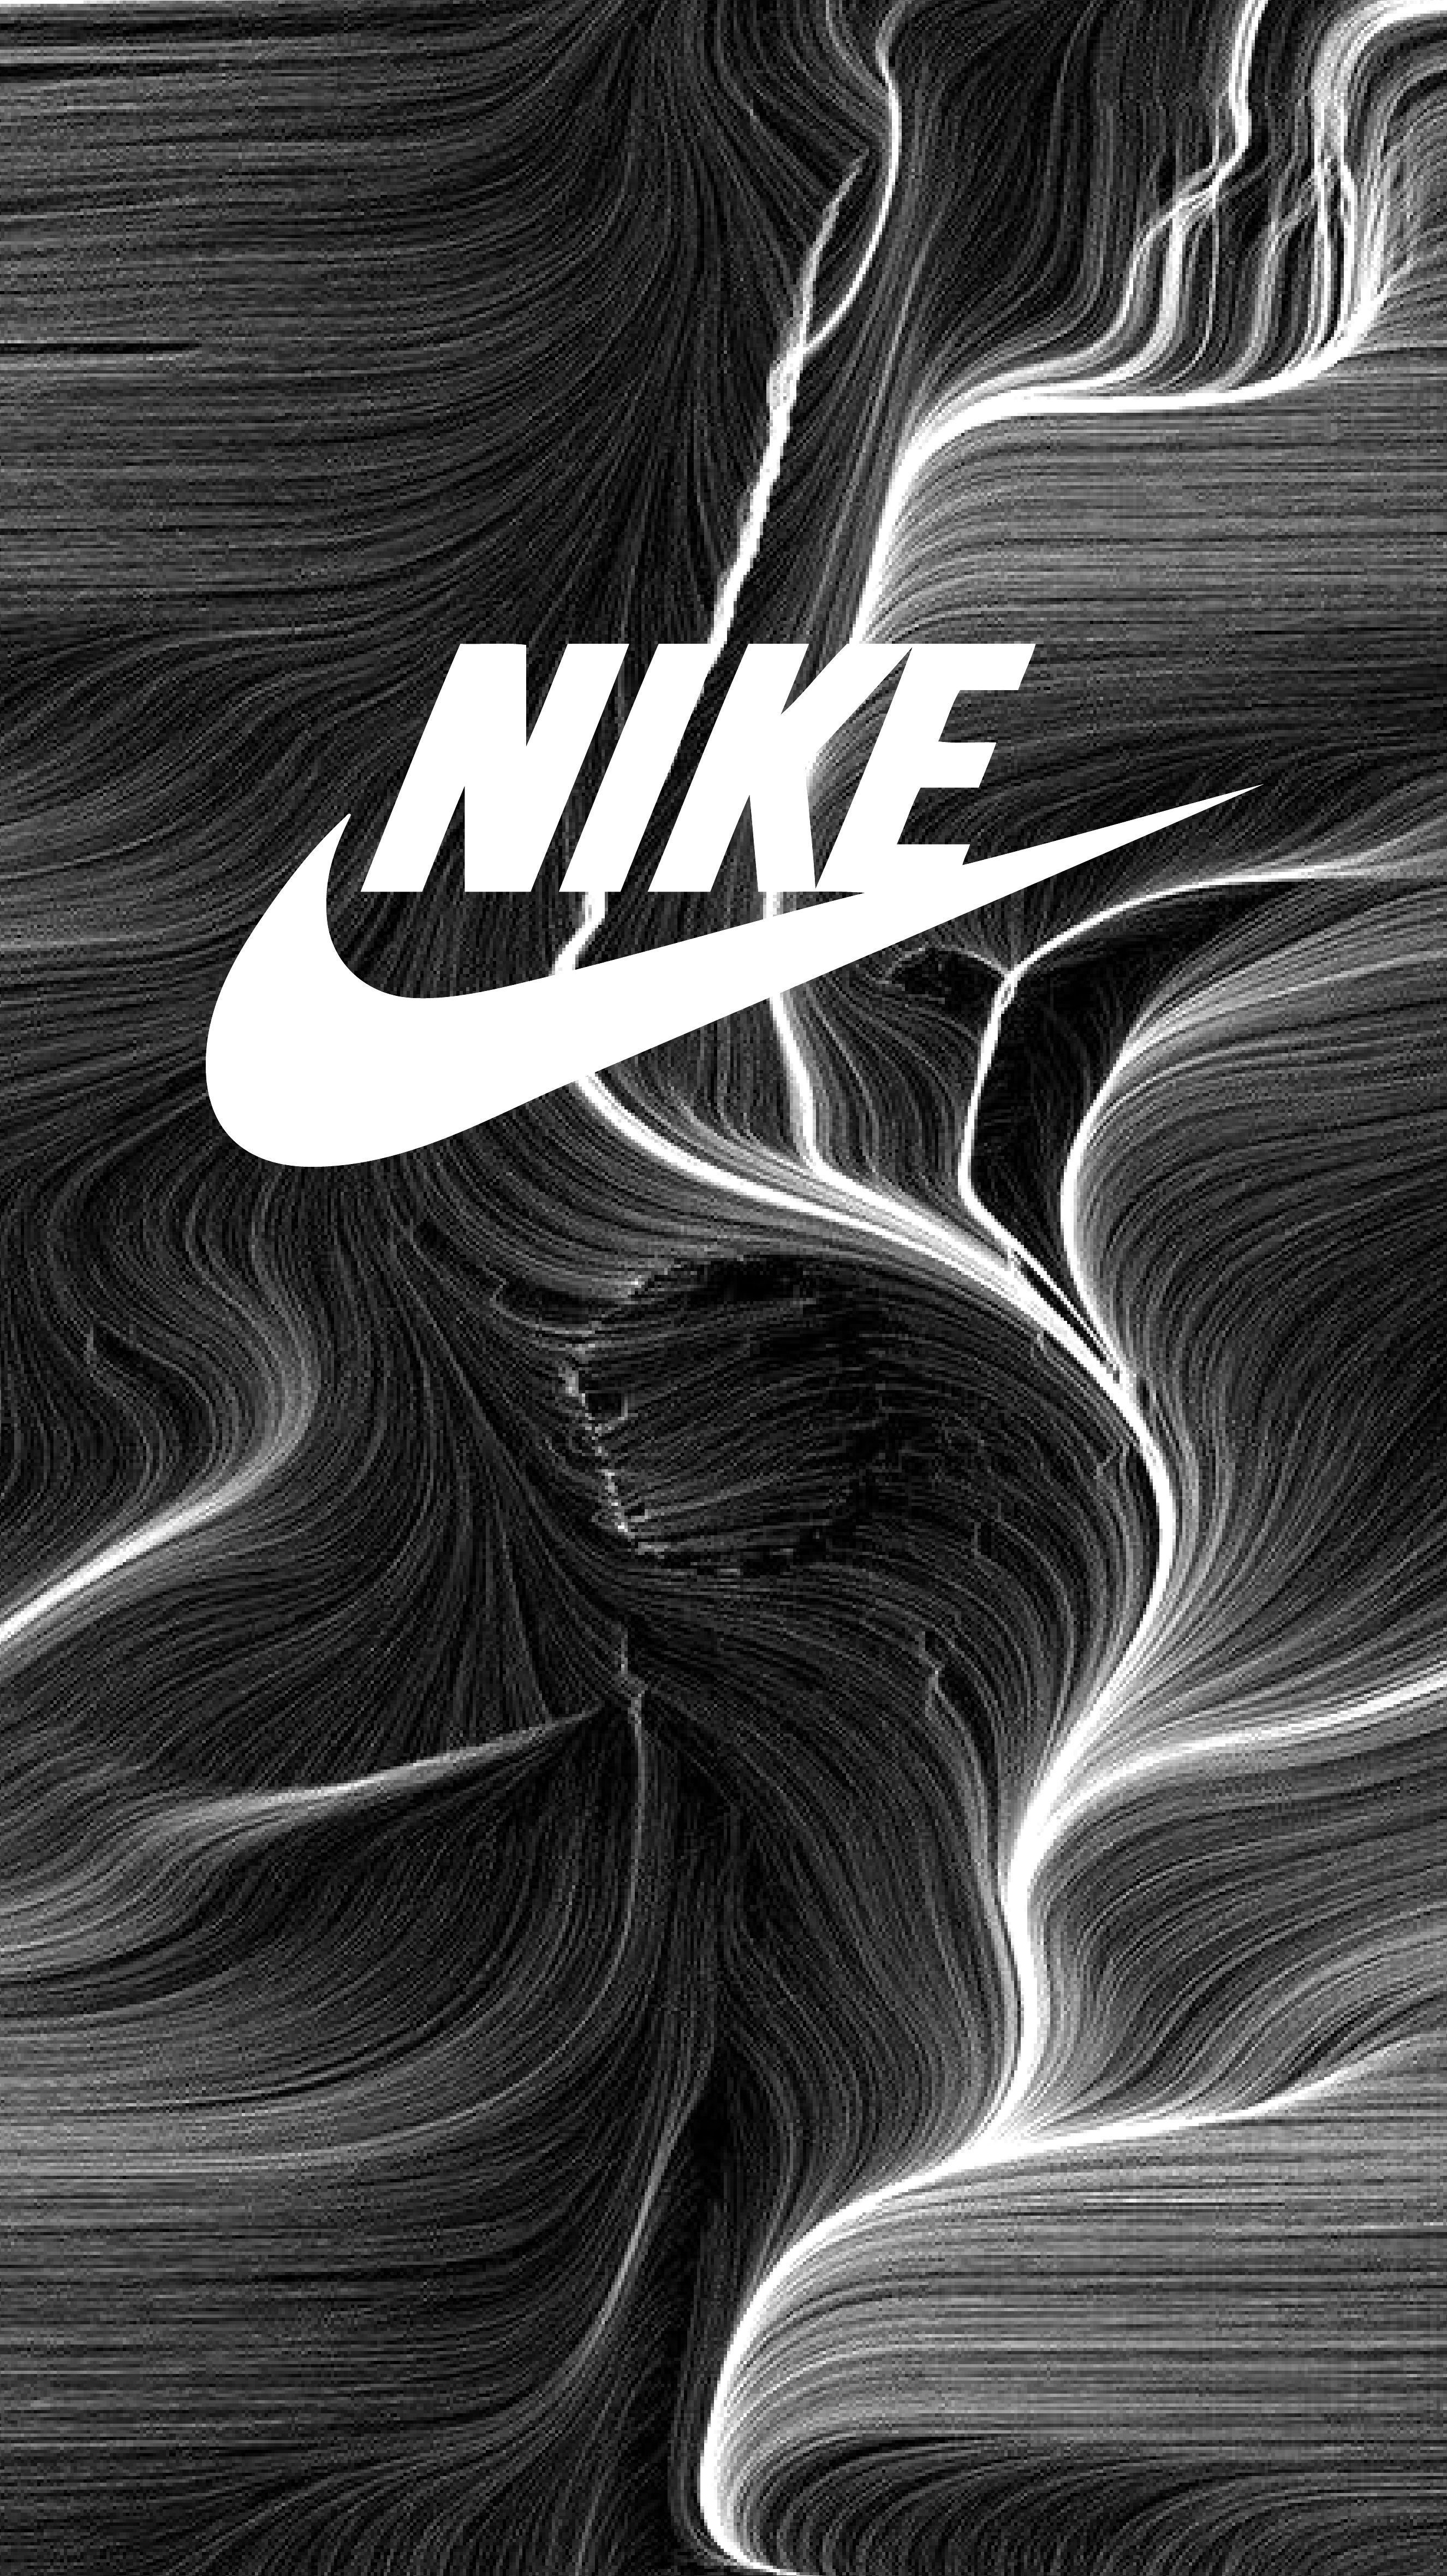 Nike Black And White Wallpapers Top Free Nike Black And White Backgrounds Wallpaperaccess Cool Nike Wallpapers Nike Wallpaper Nike Screensavers